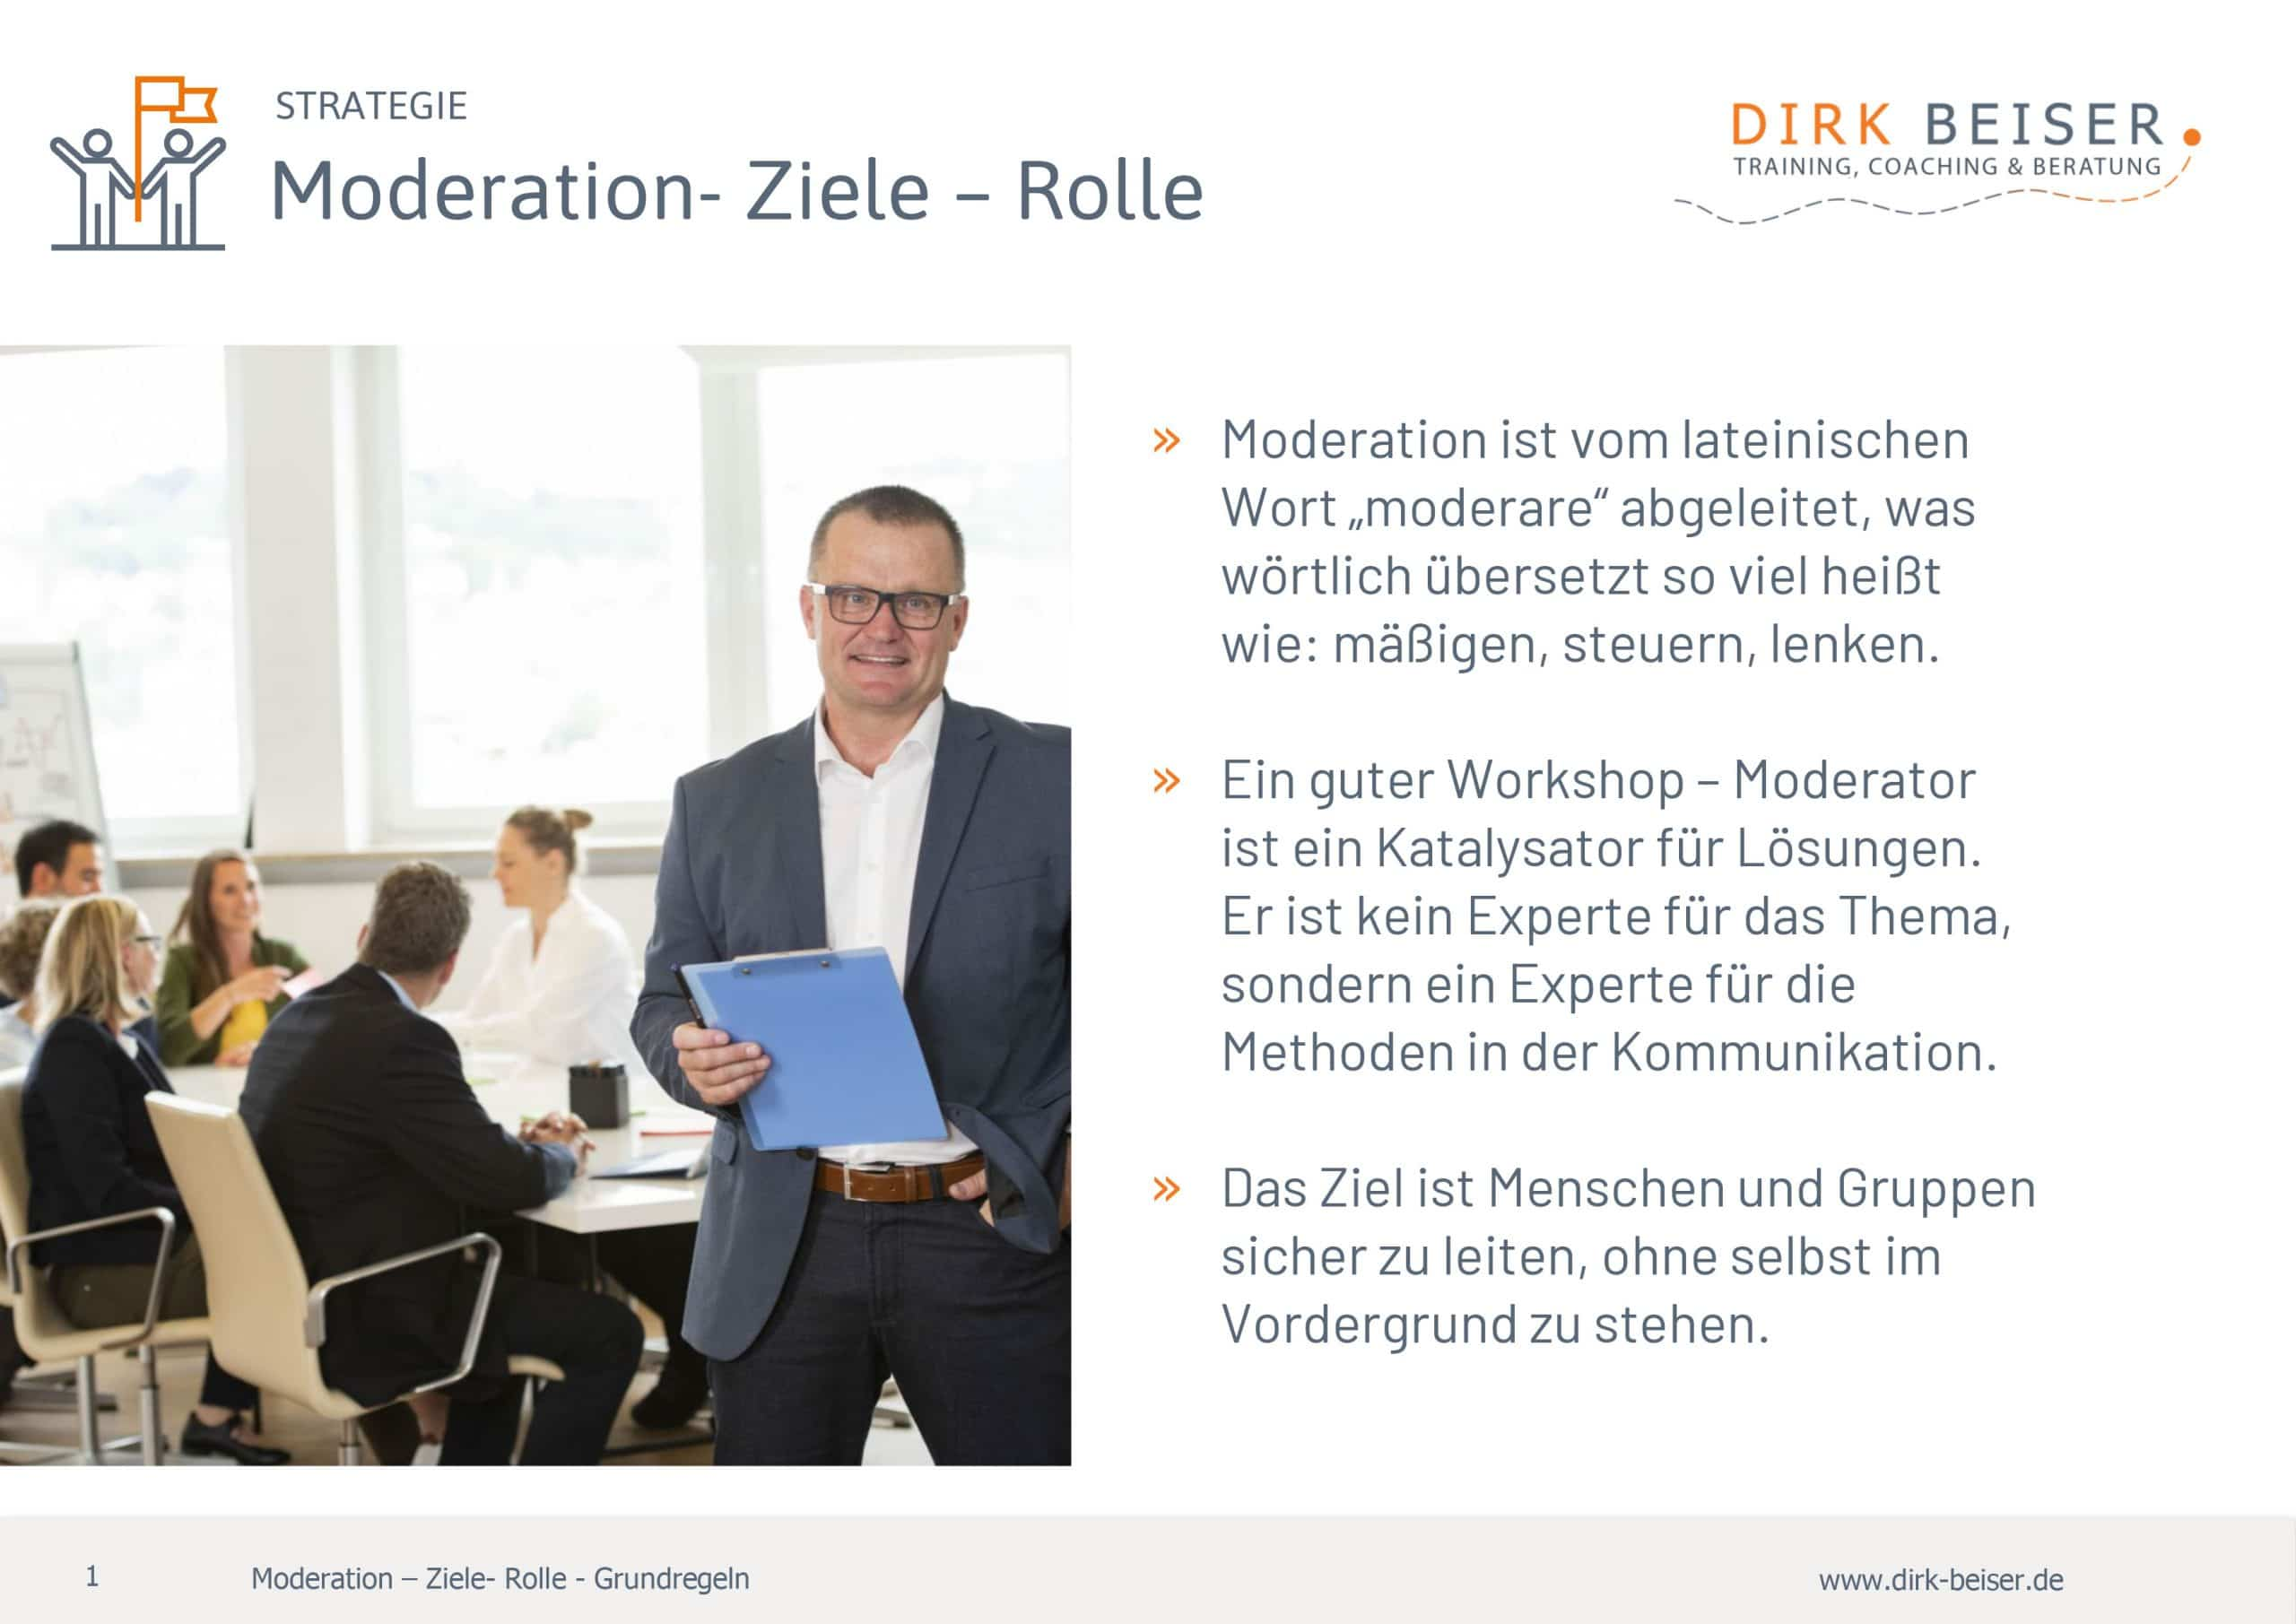 Moderation Ziele Rolle Grundregeln Strategie